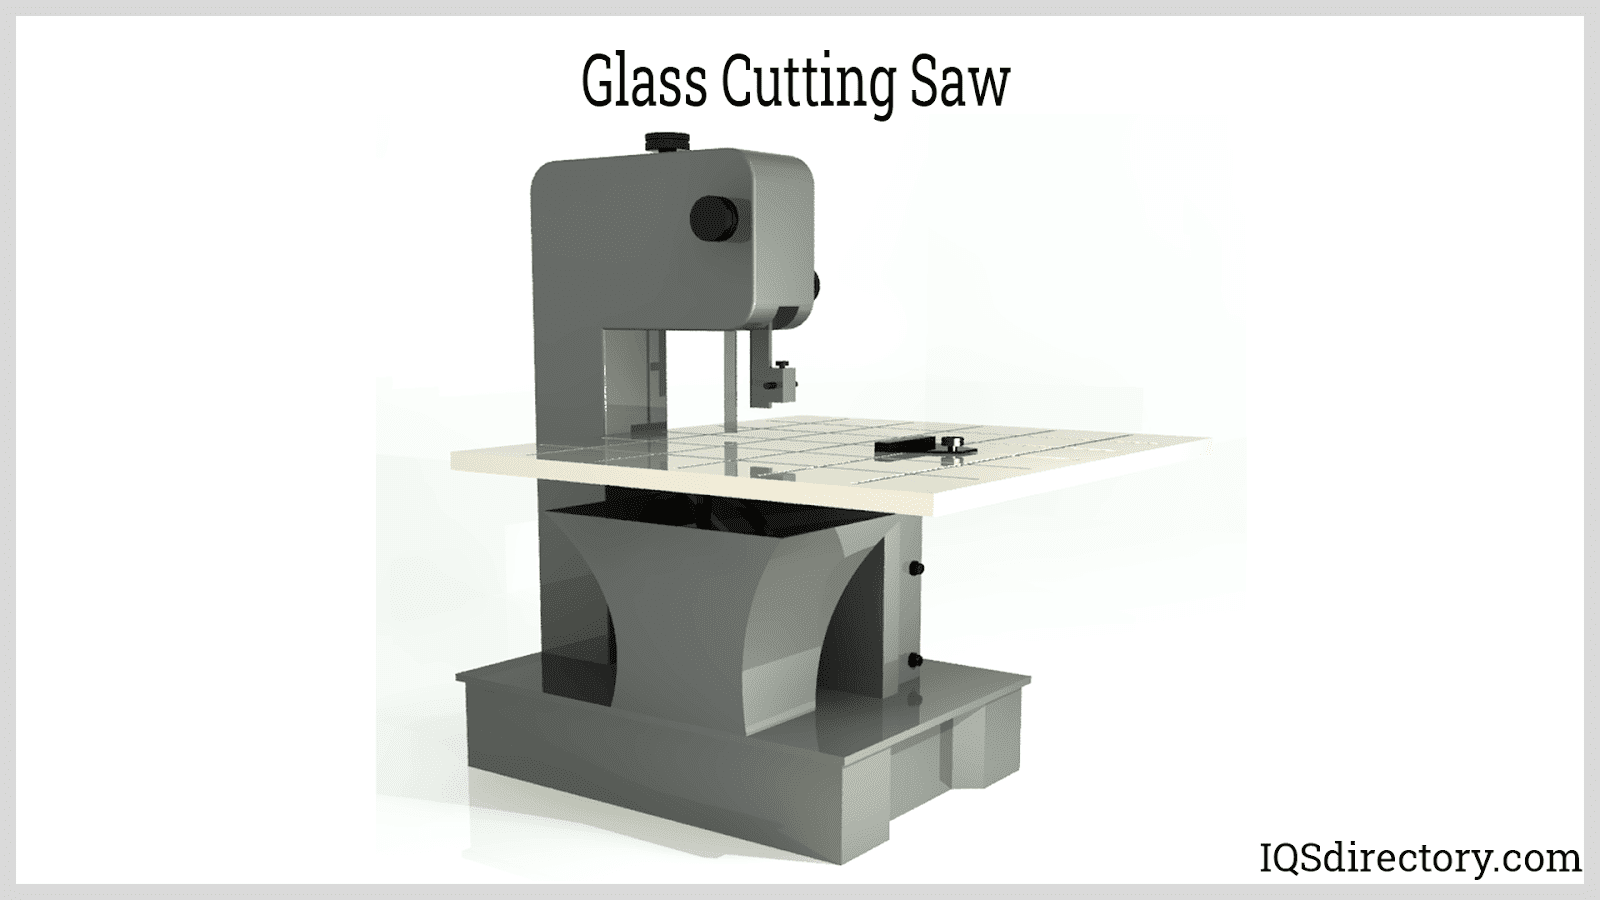 Glass Cutting Saw